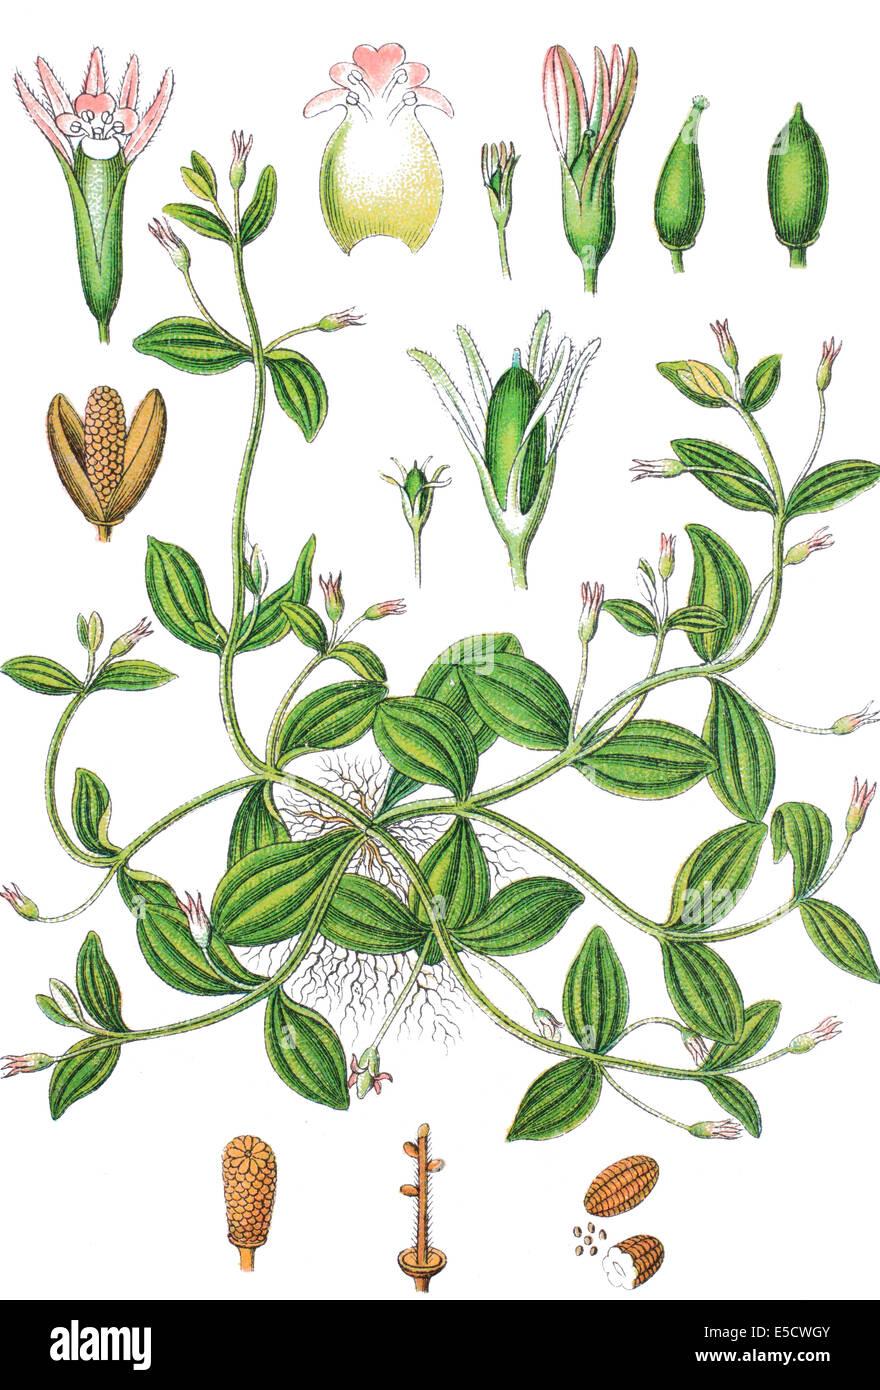 prostrate false pimpernel, Lindernia procumbens - Stock Image